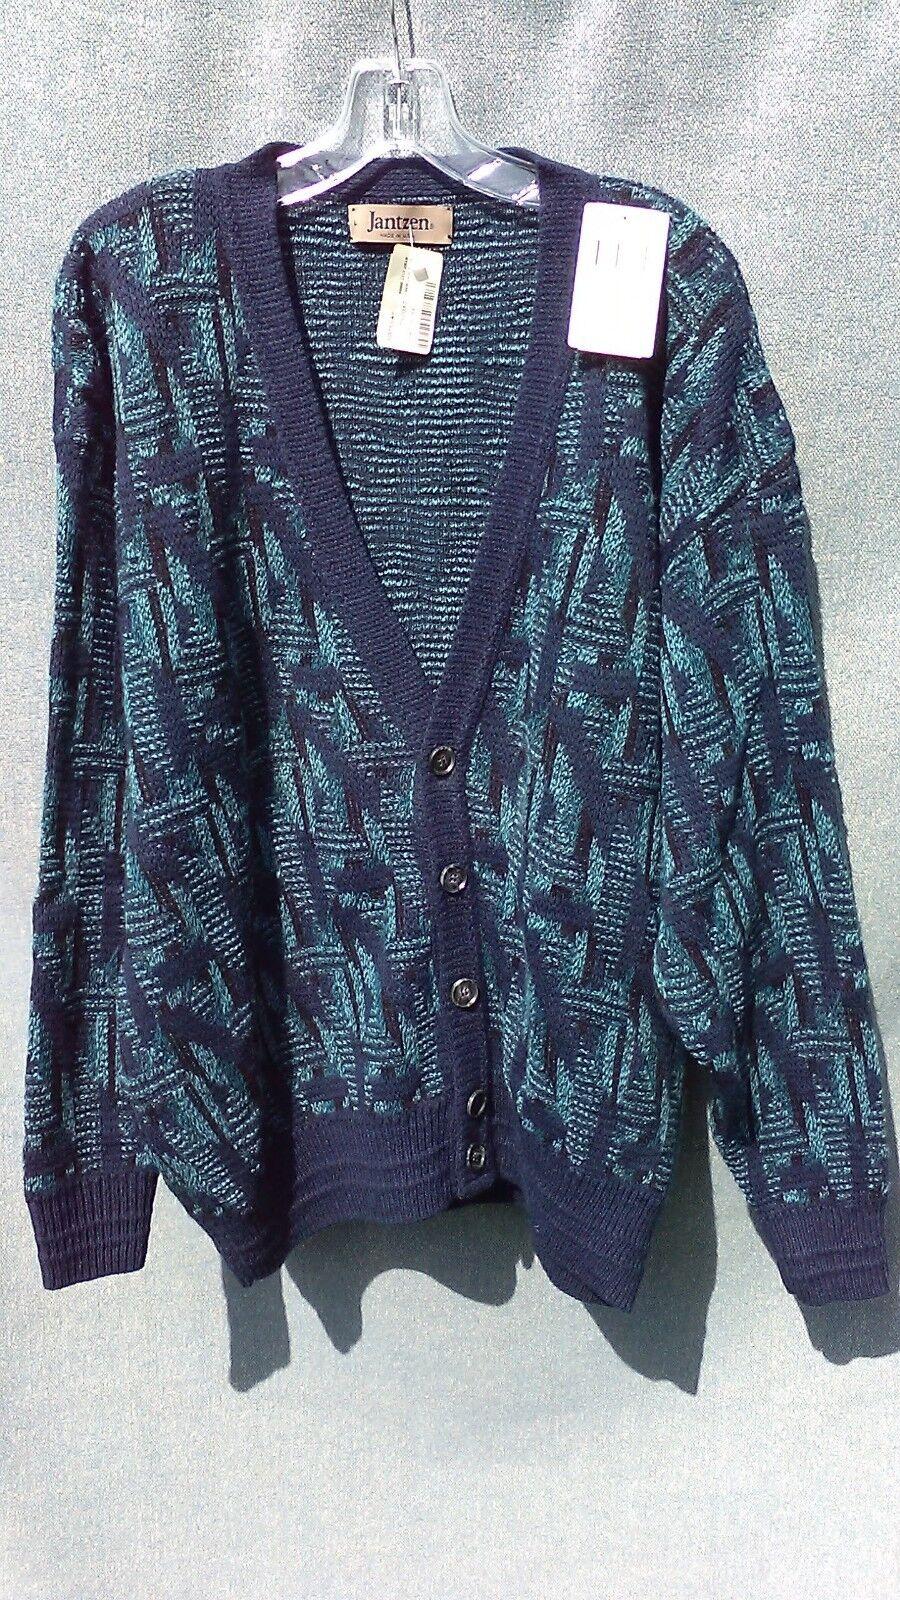 NWT VTG Jantzen  Herren Cardigan Sweater USA Größe L Blau Grün Geometric Button up